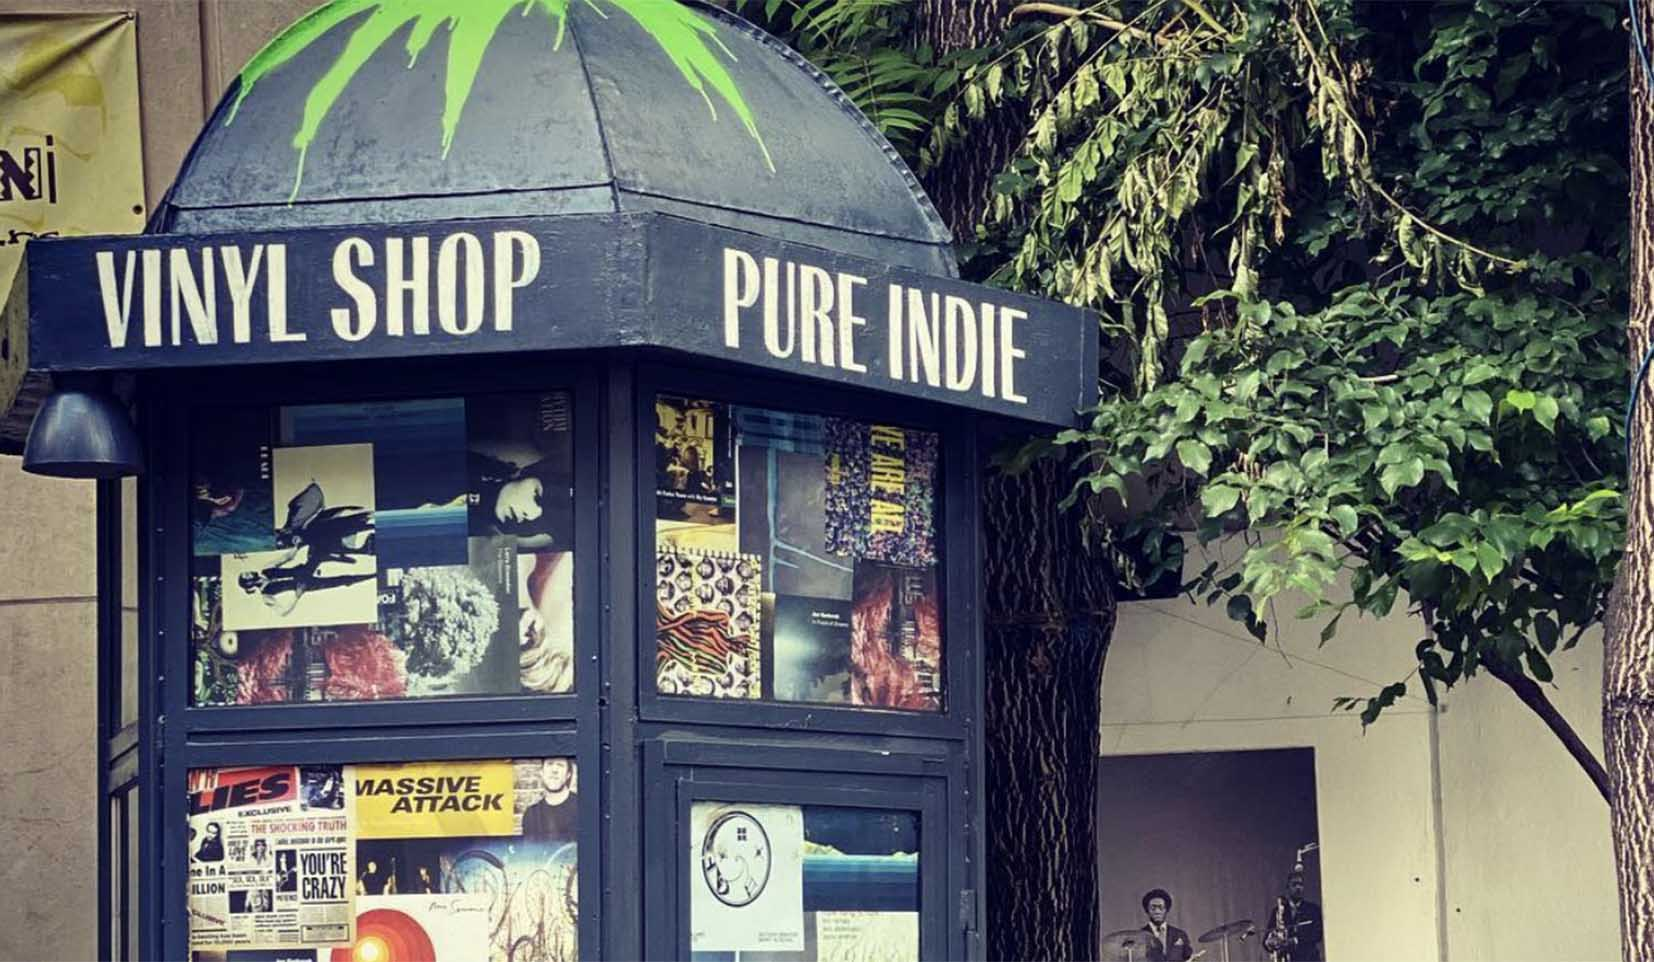 pureindie-vinyl-web